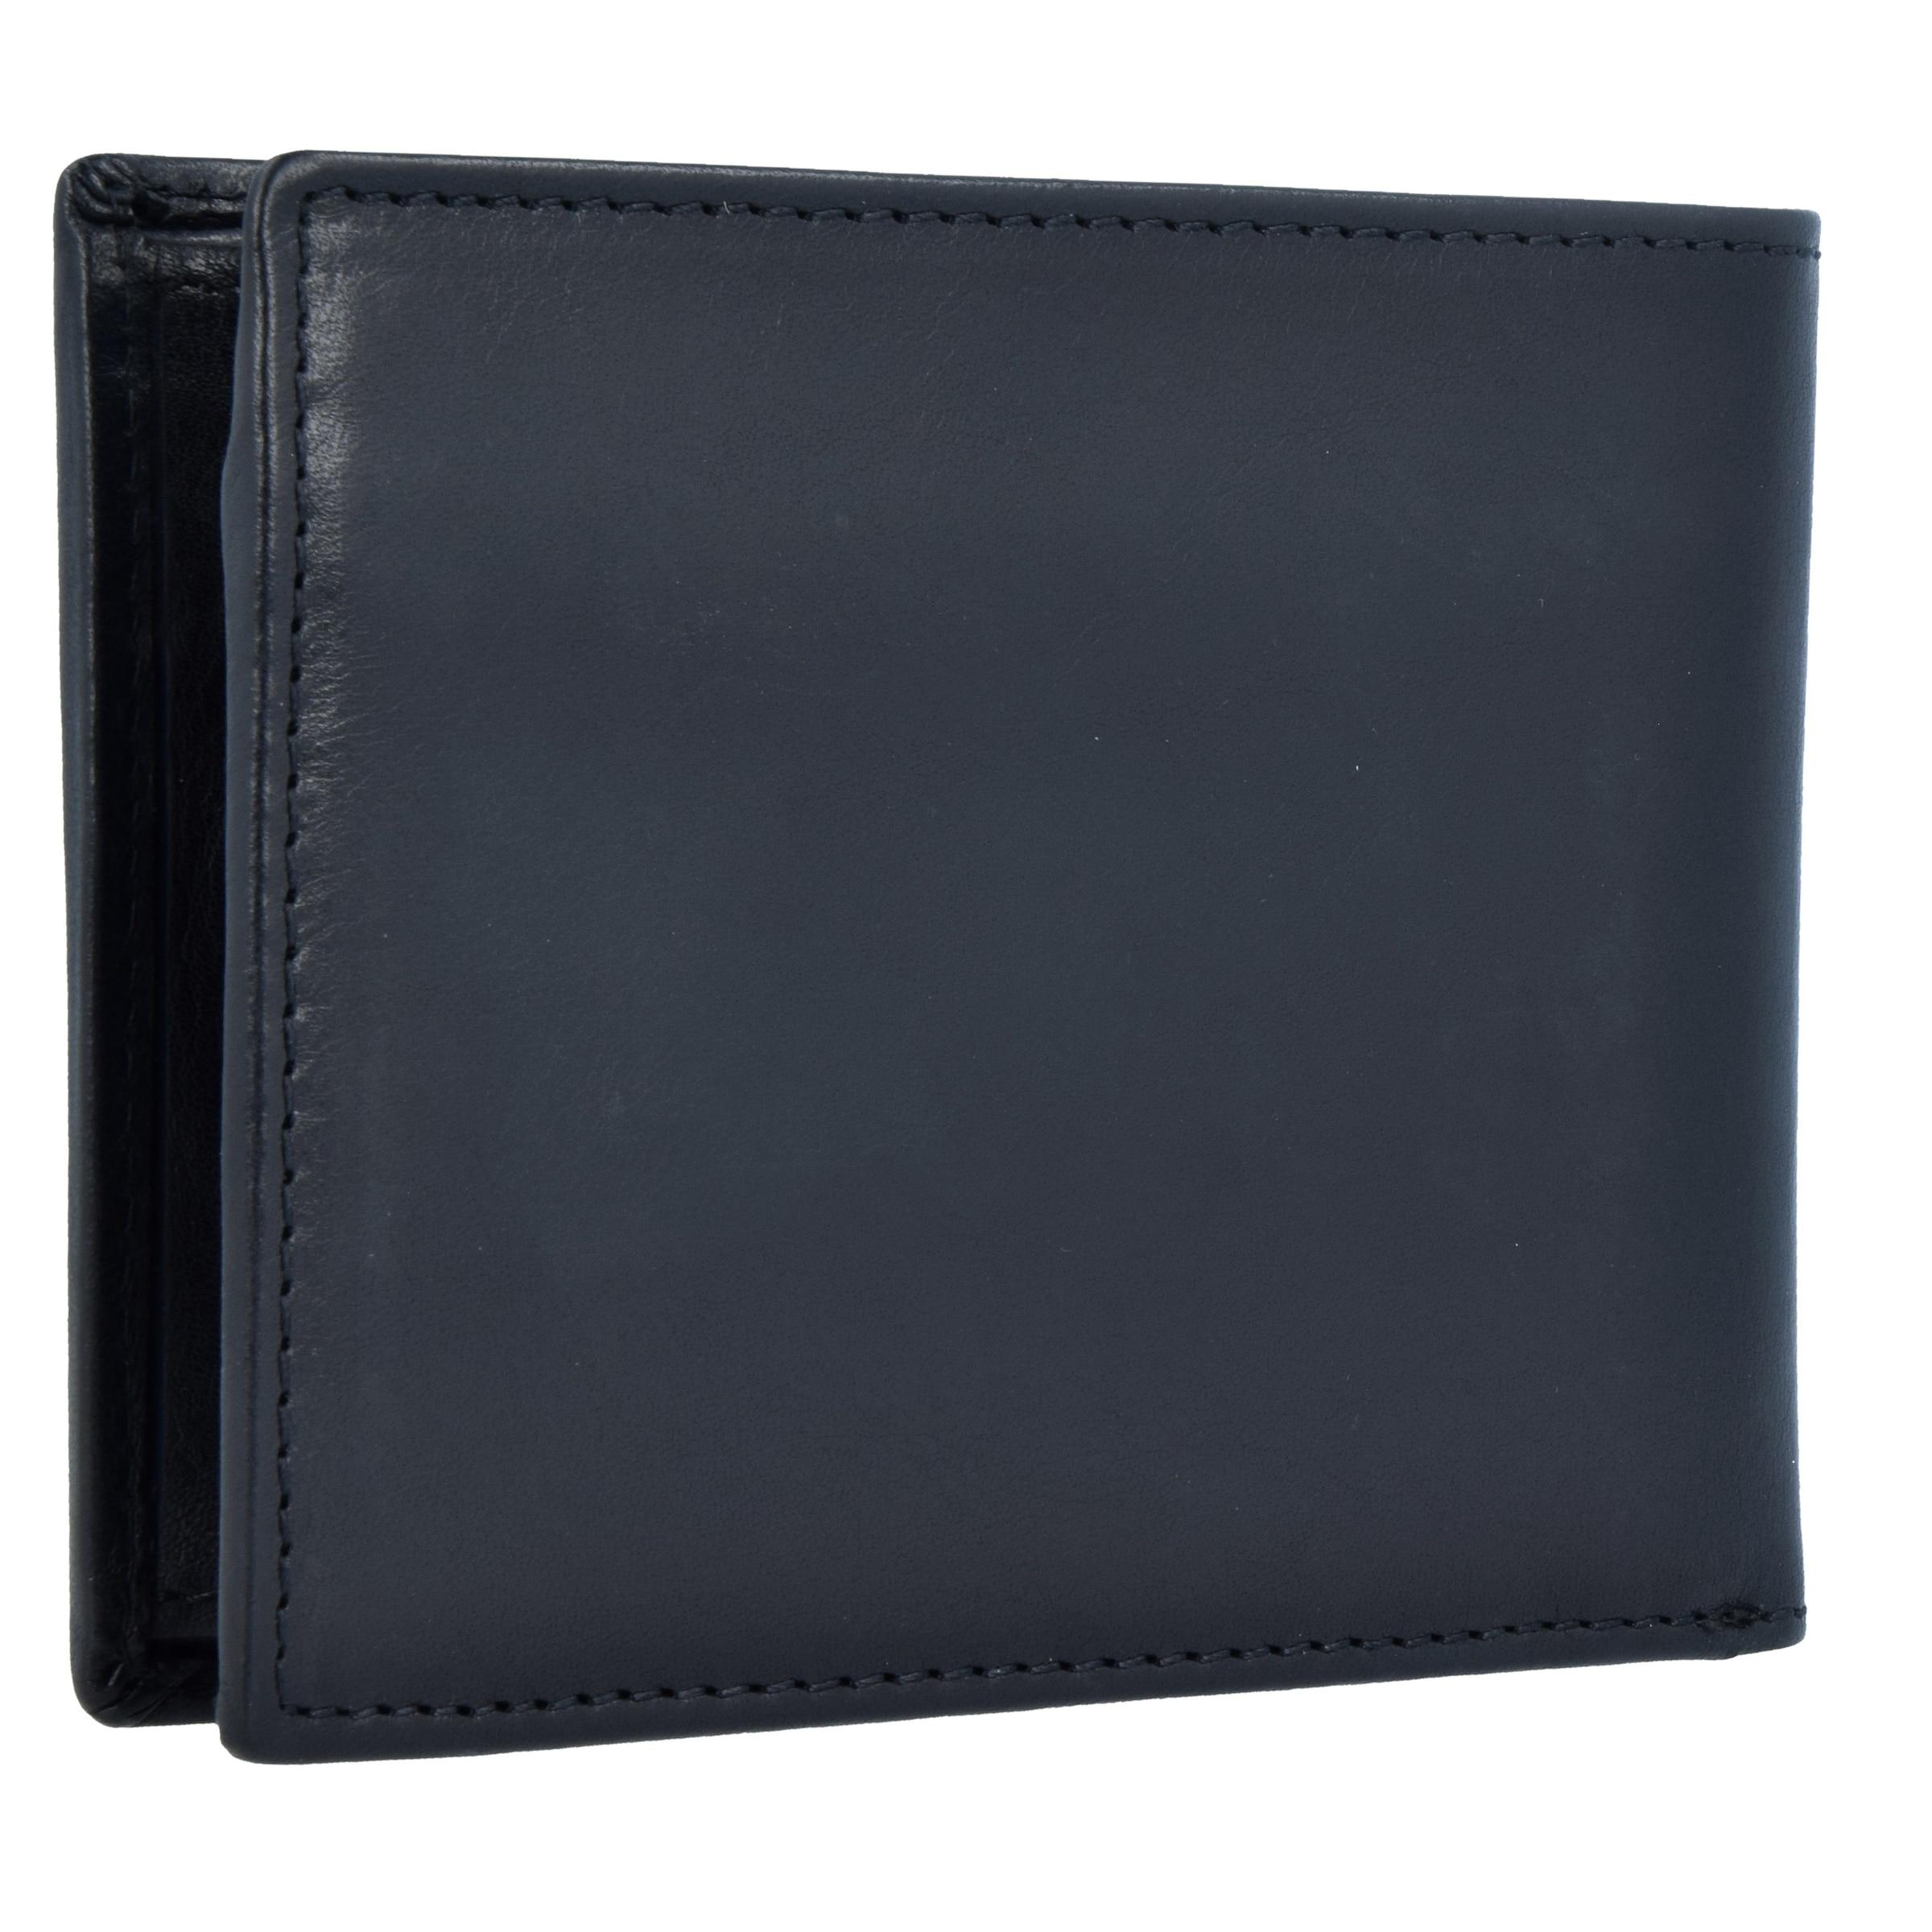 Büffel Braun En Porte monnaies 'cambridge' Noir 7b6gyvfY